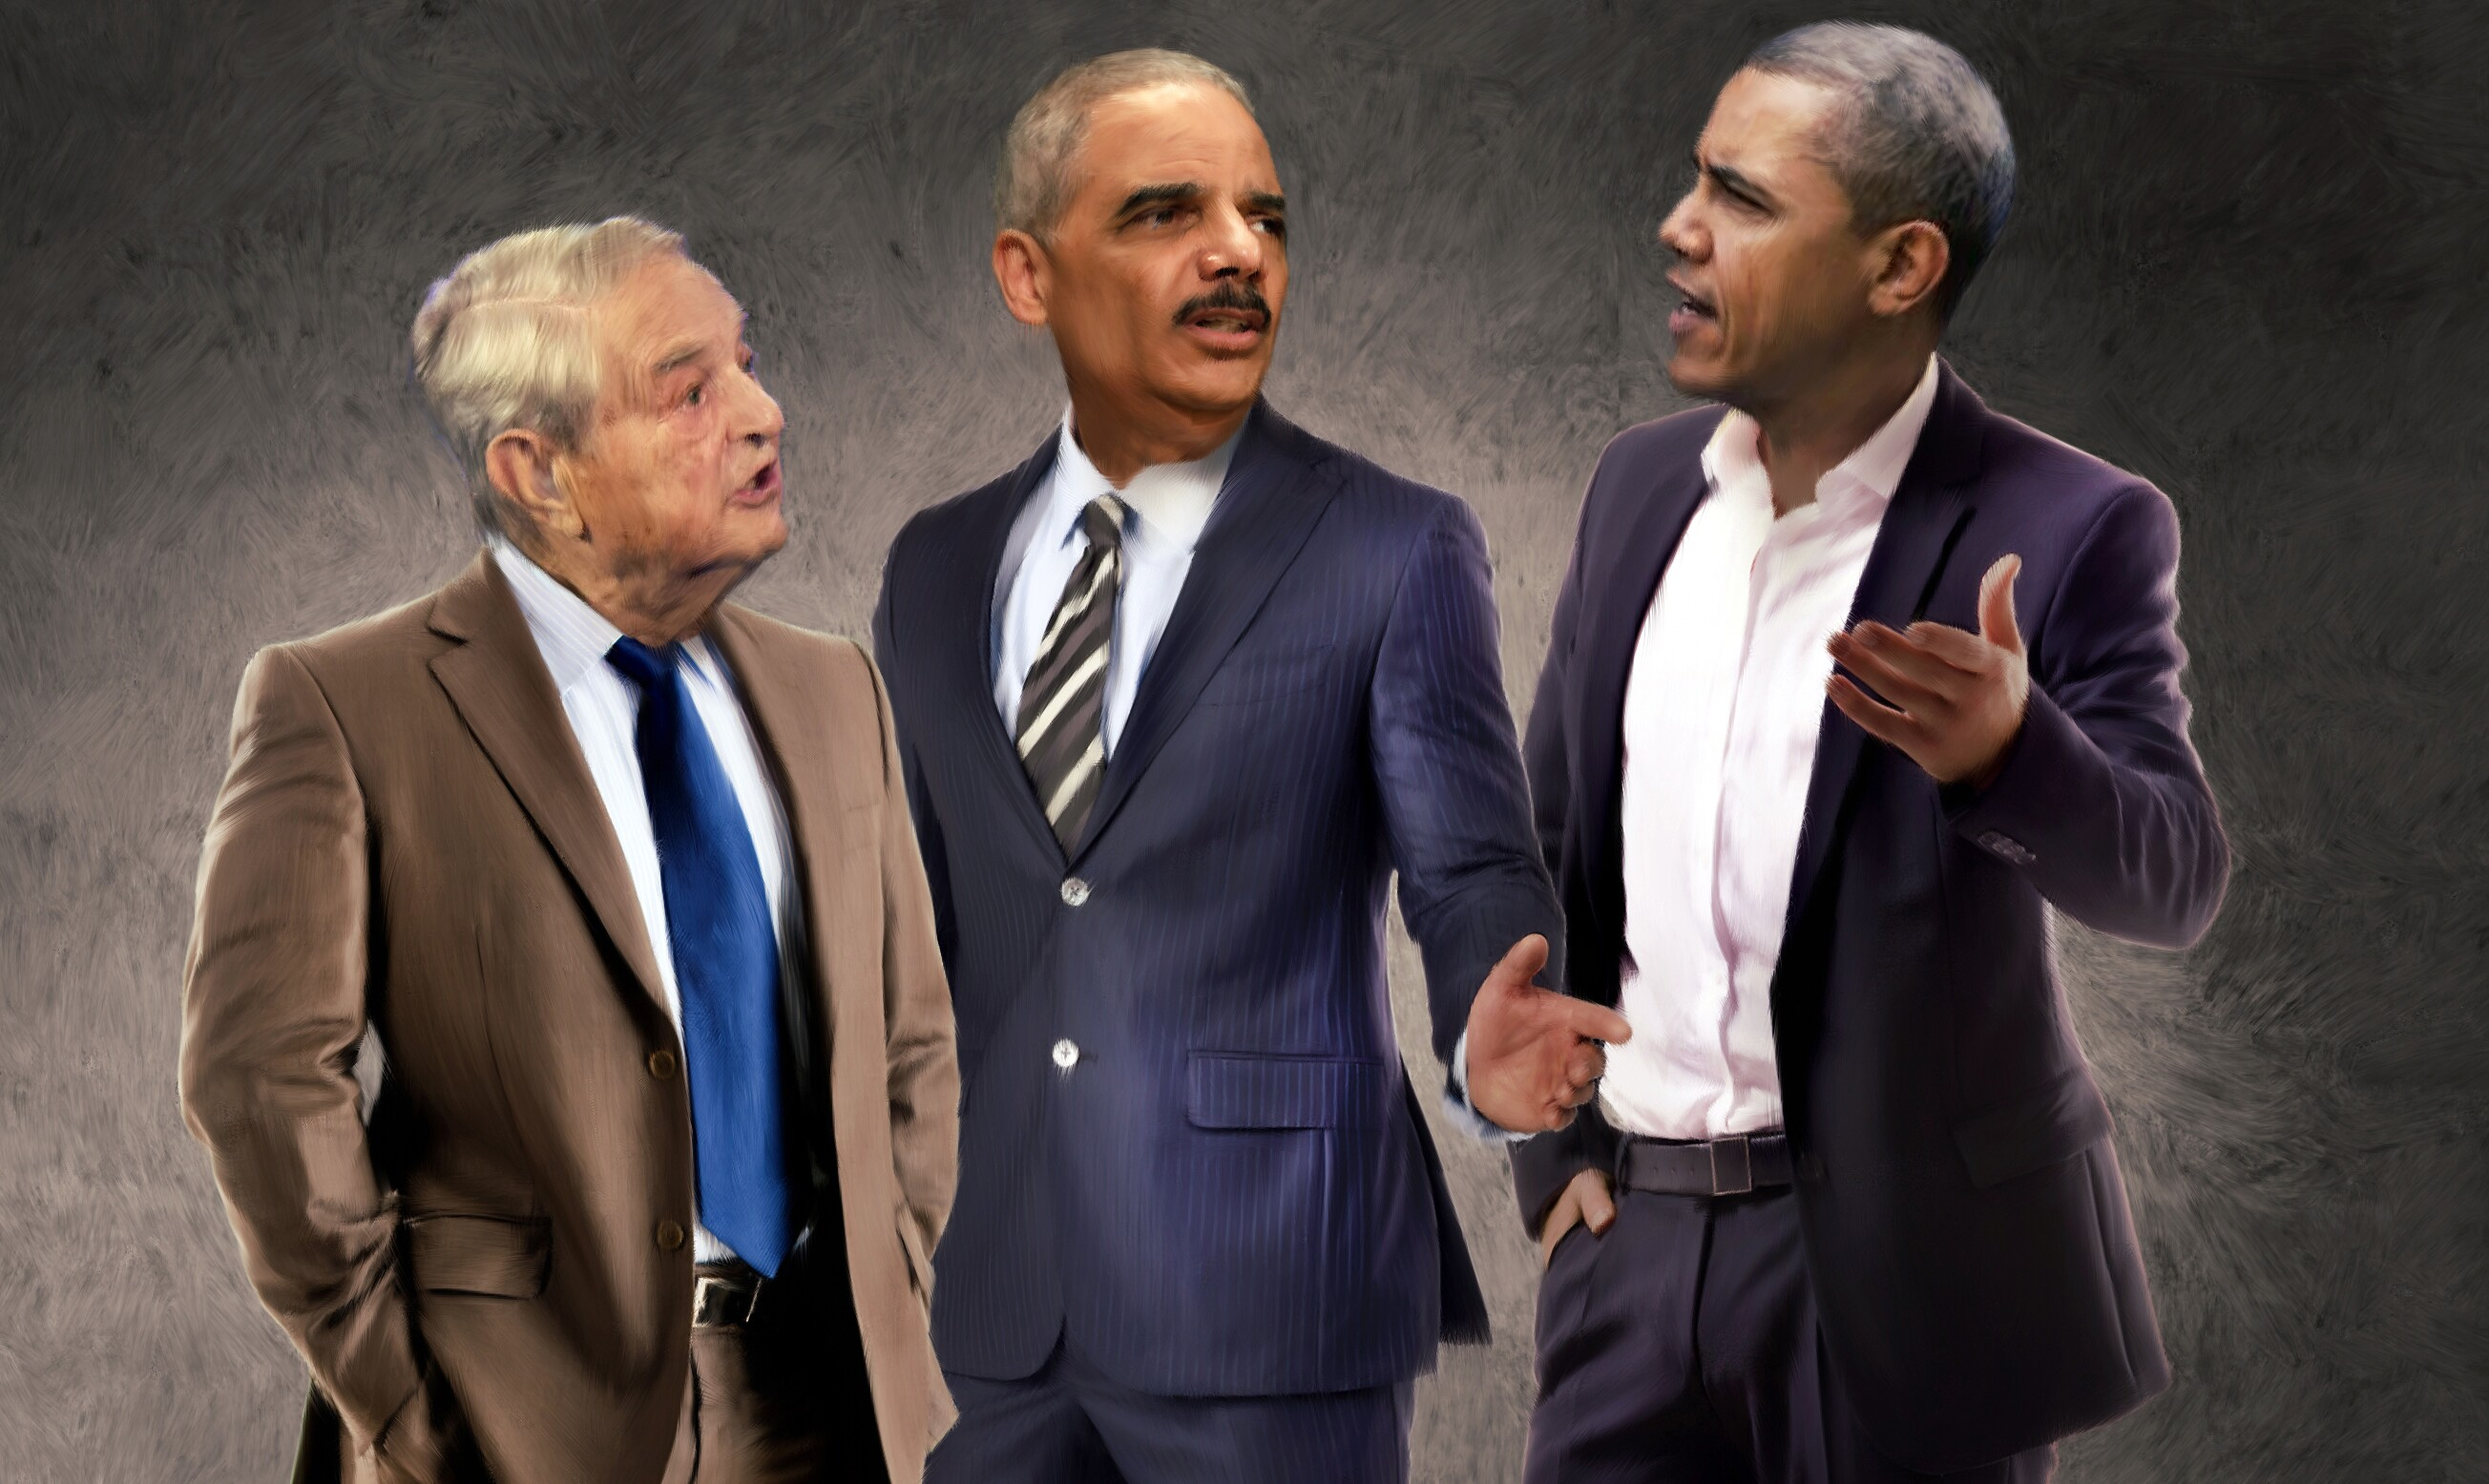 Barack Obama: The former president who won\'t go away